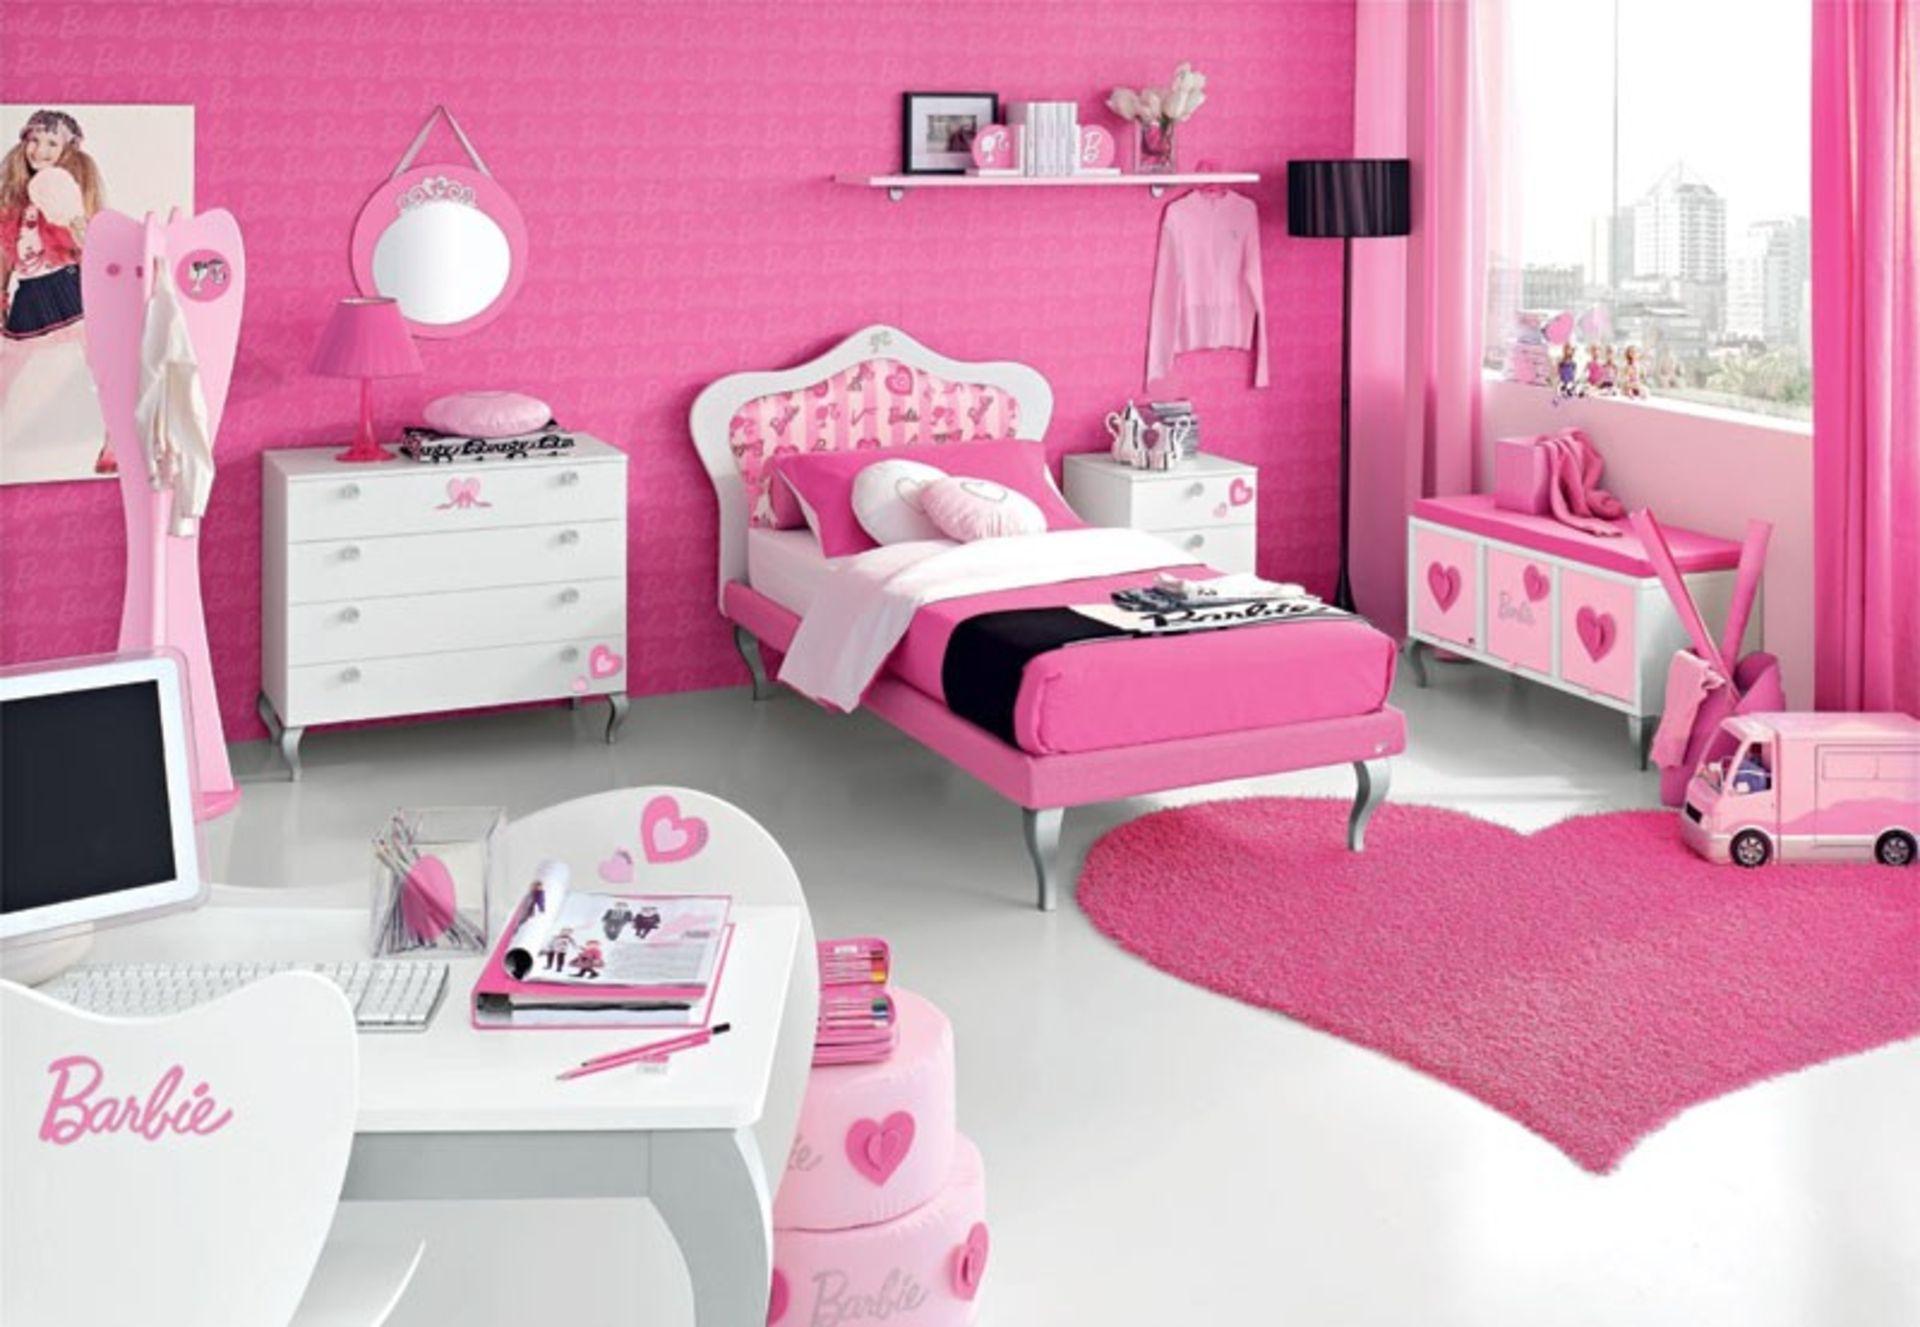 Pink Bedroom Designs For Adults Beauteous Cutepinkgirlbarbiethemedbedroomdesigndecoratingideas 2018